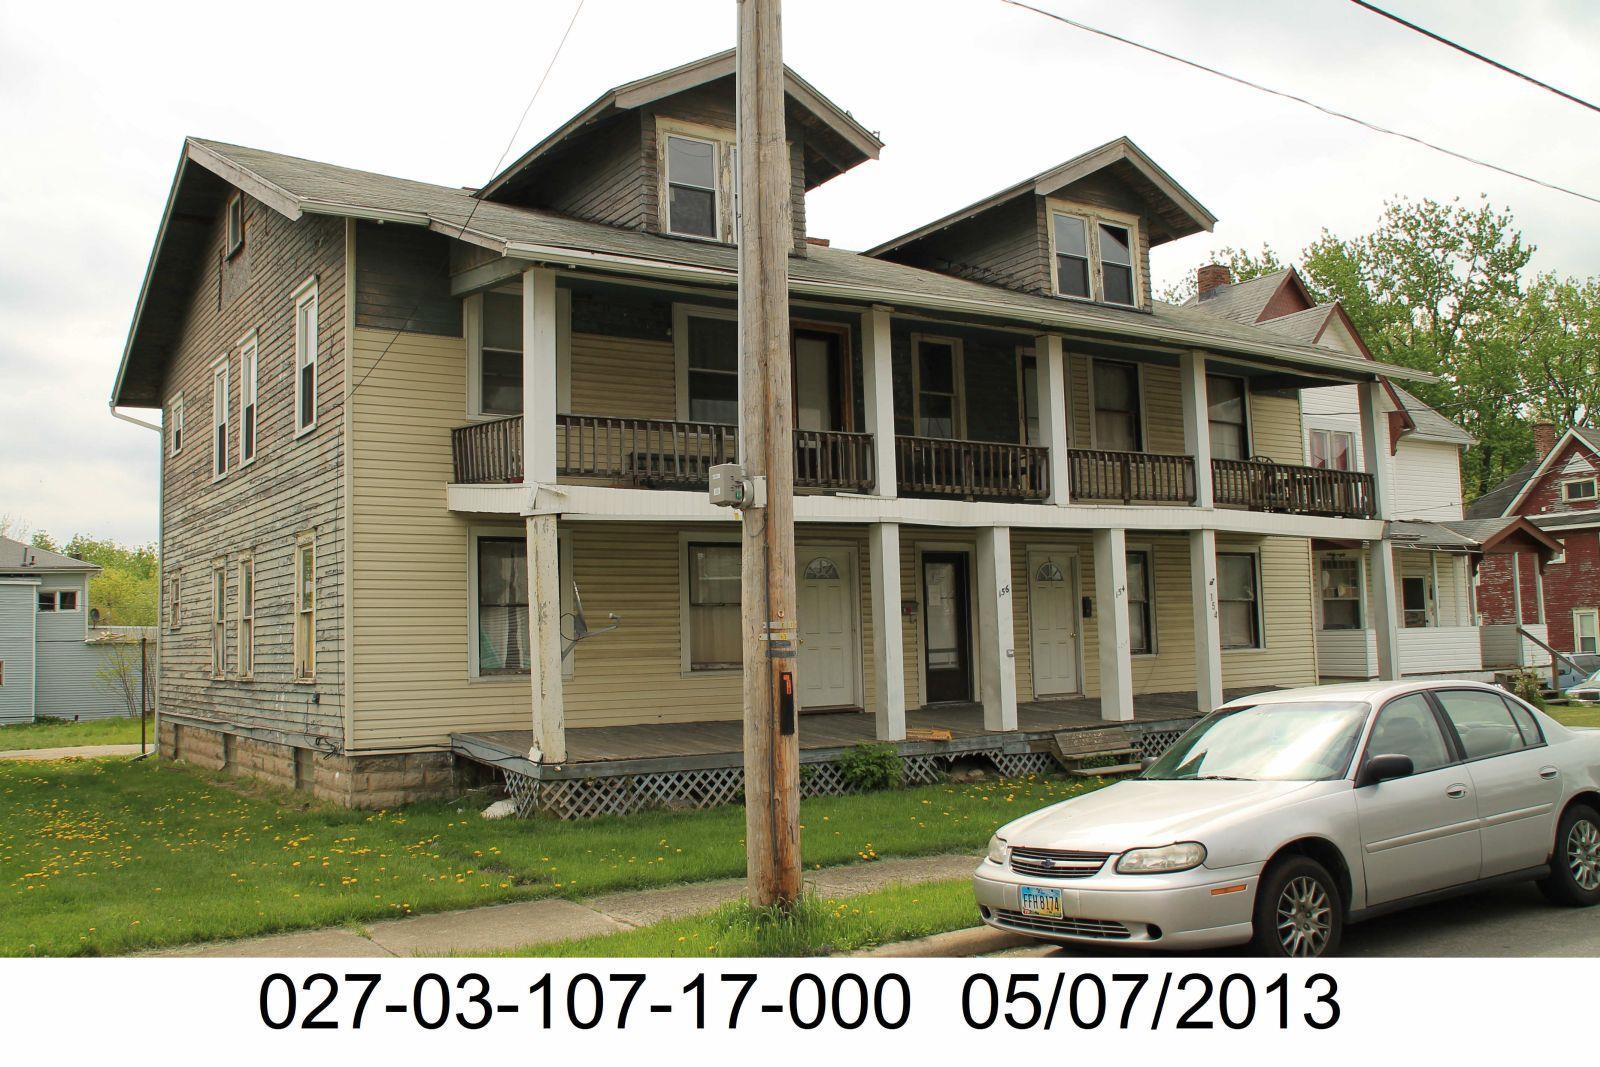 List Properties Owned By Douglas Bruce Colorado Springs